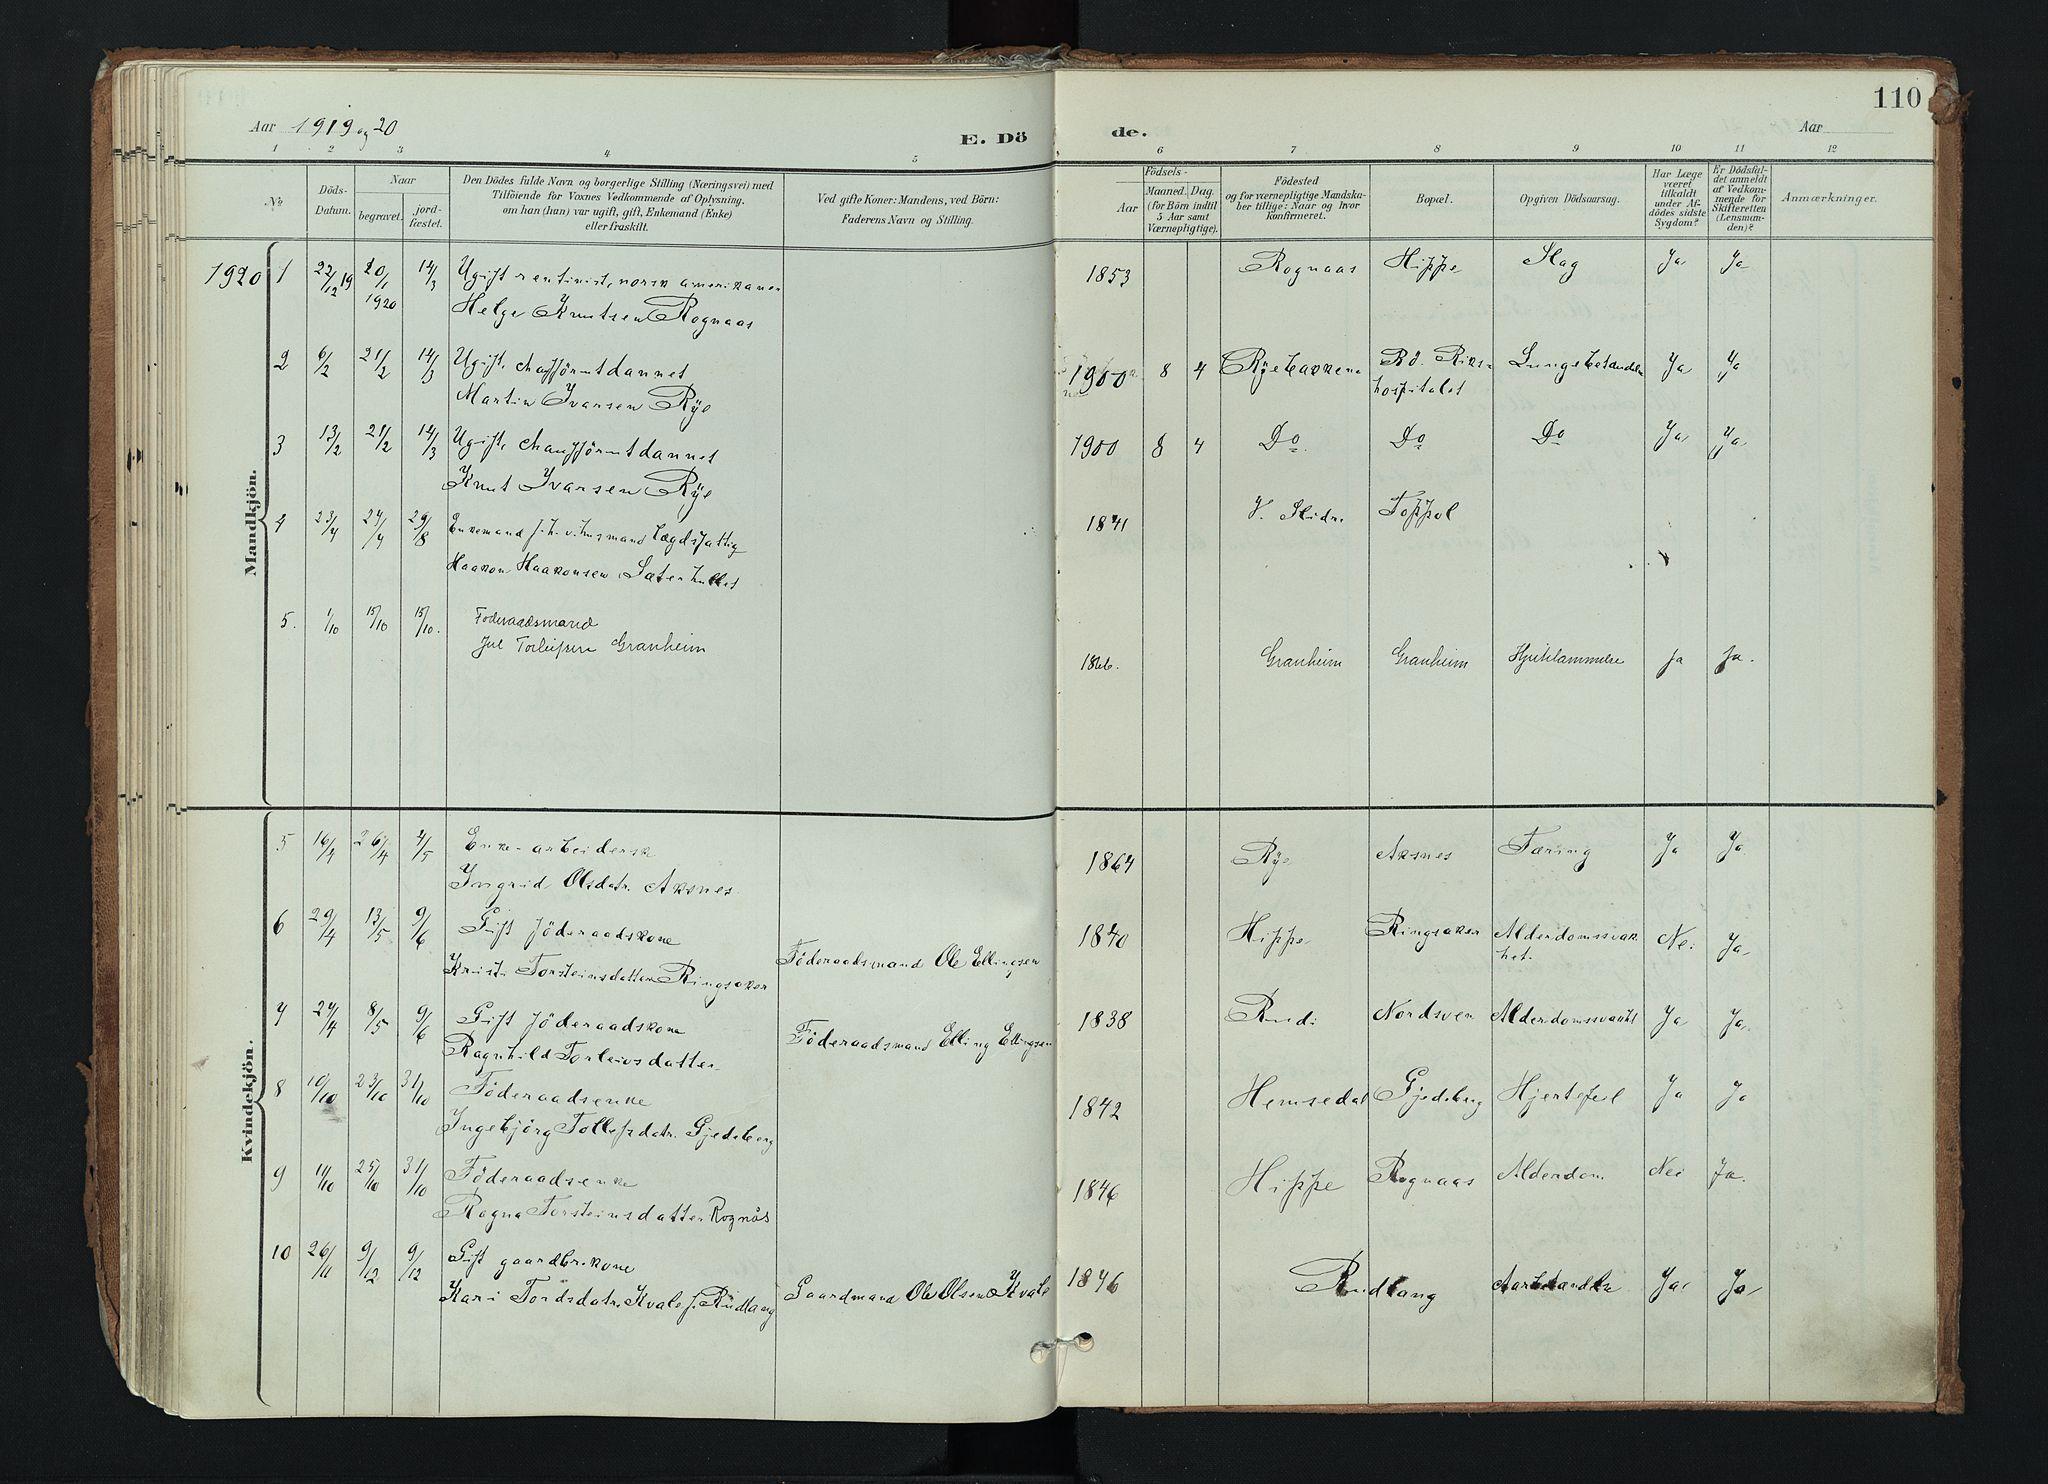 SAH, Nord-Aurdal prestekontor, Ministerialbok nr. 17, 1897-1926, s. 110